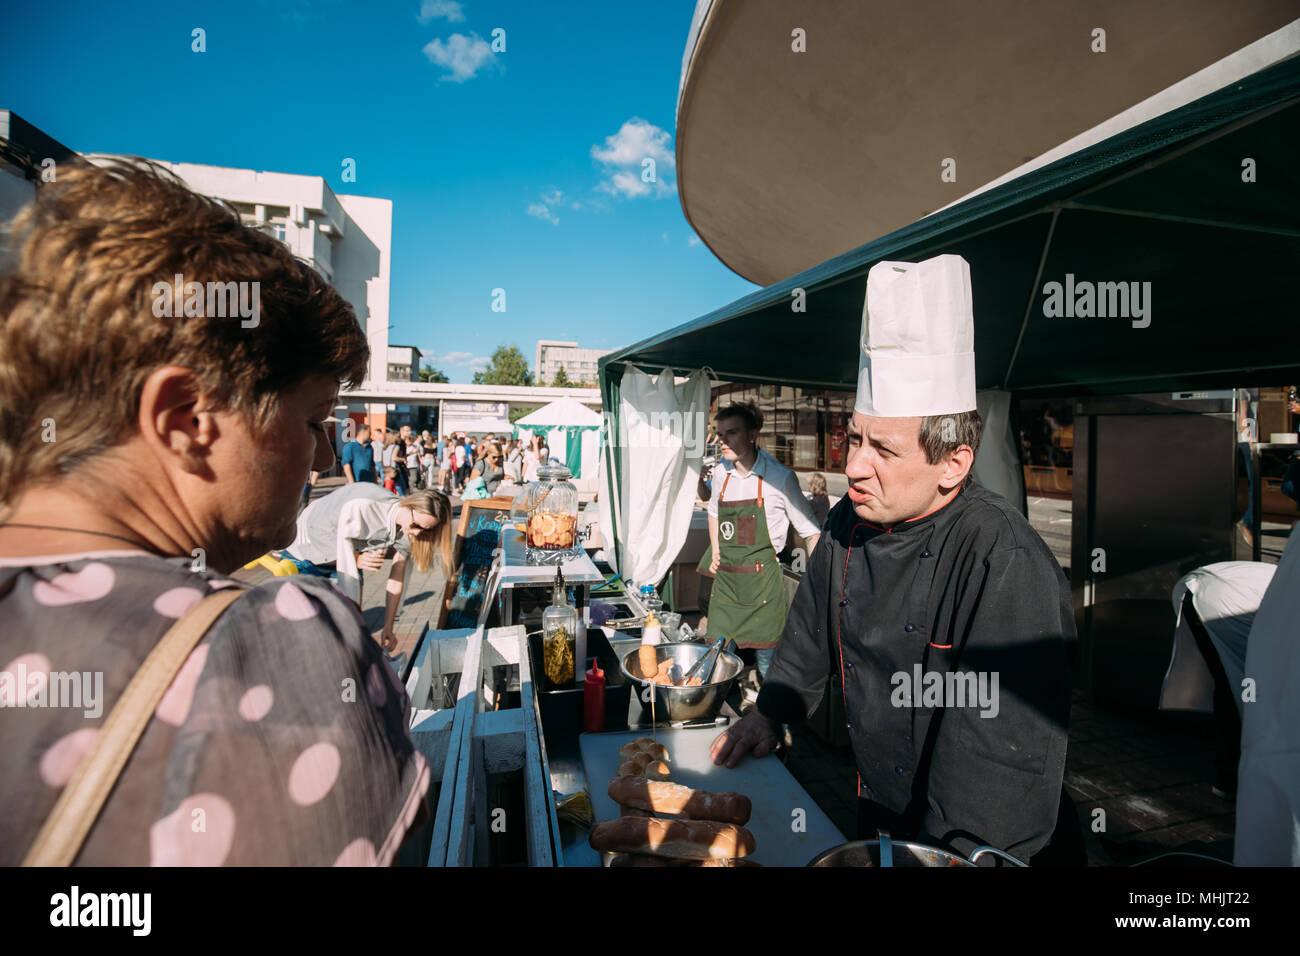 Gomel, Belarus. Gastronomic Festival City Food In Summer Day. - Stock Image